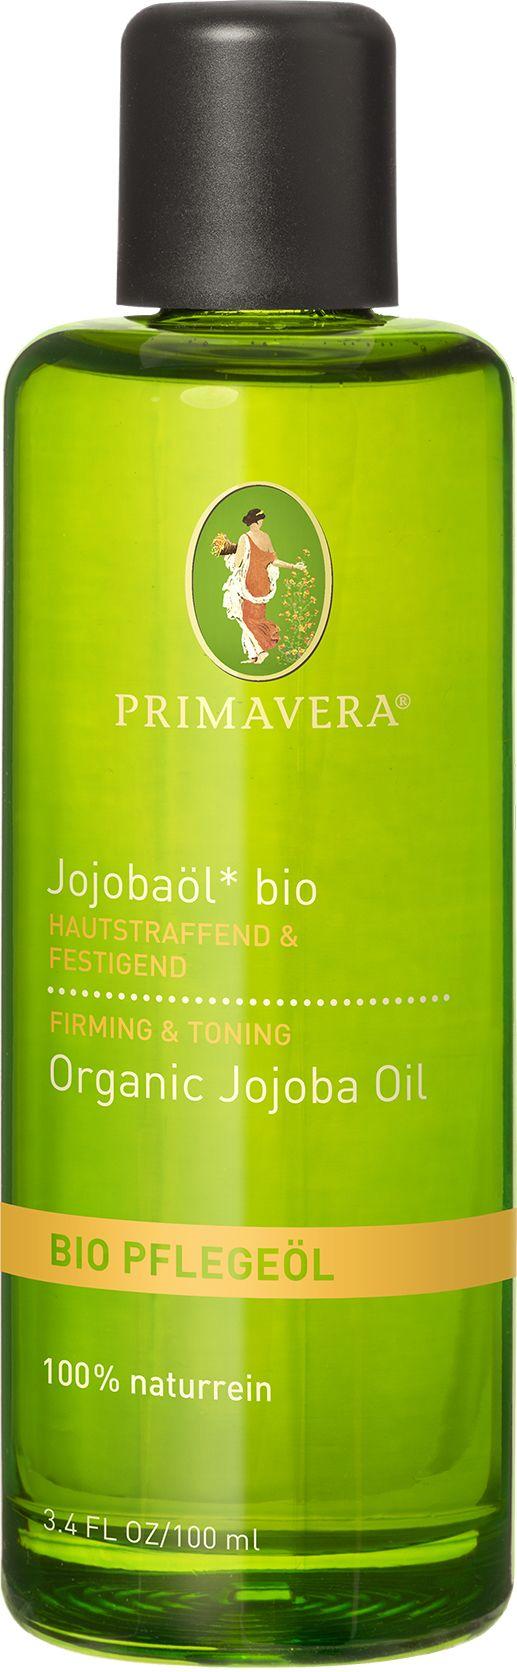 Jojobaöl bio (100ml)